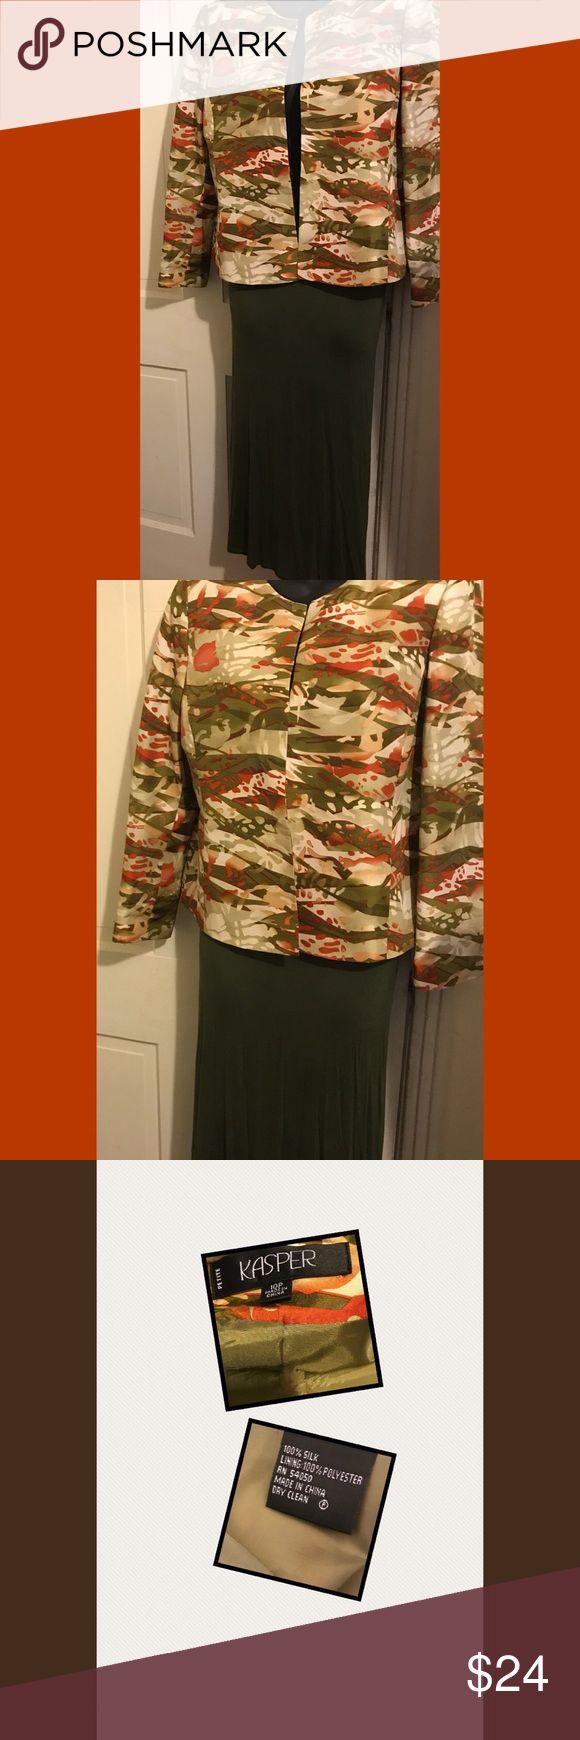 Kasper Petite Blazer / Jacket Beautiful Blazer / jacket .... Open front no buttons 💯 Silk (Army Green Skirt NOT Included just an 💡) - Smoke & Pet Free Home Kasper Jackets & Coats Blazers